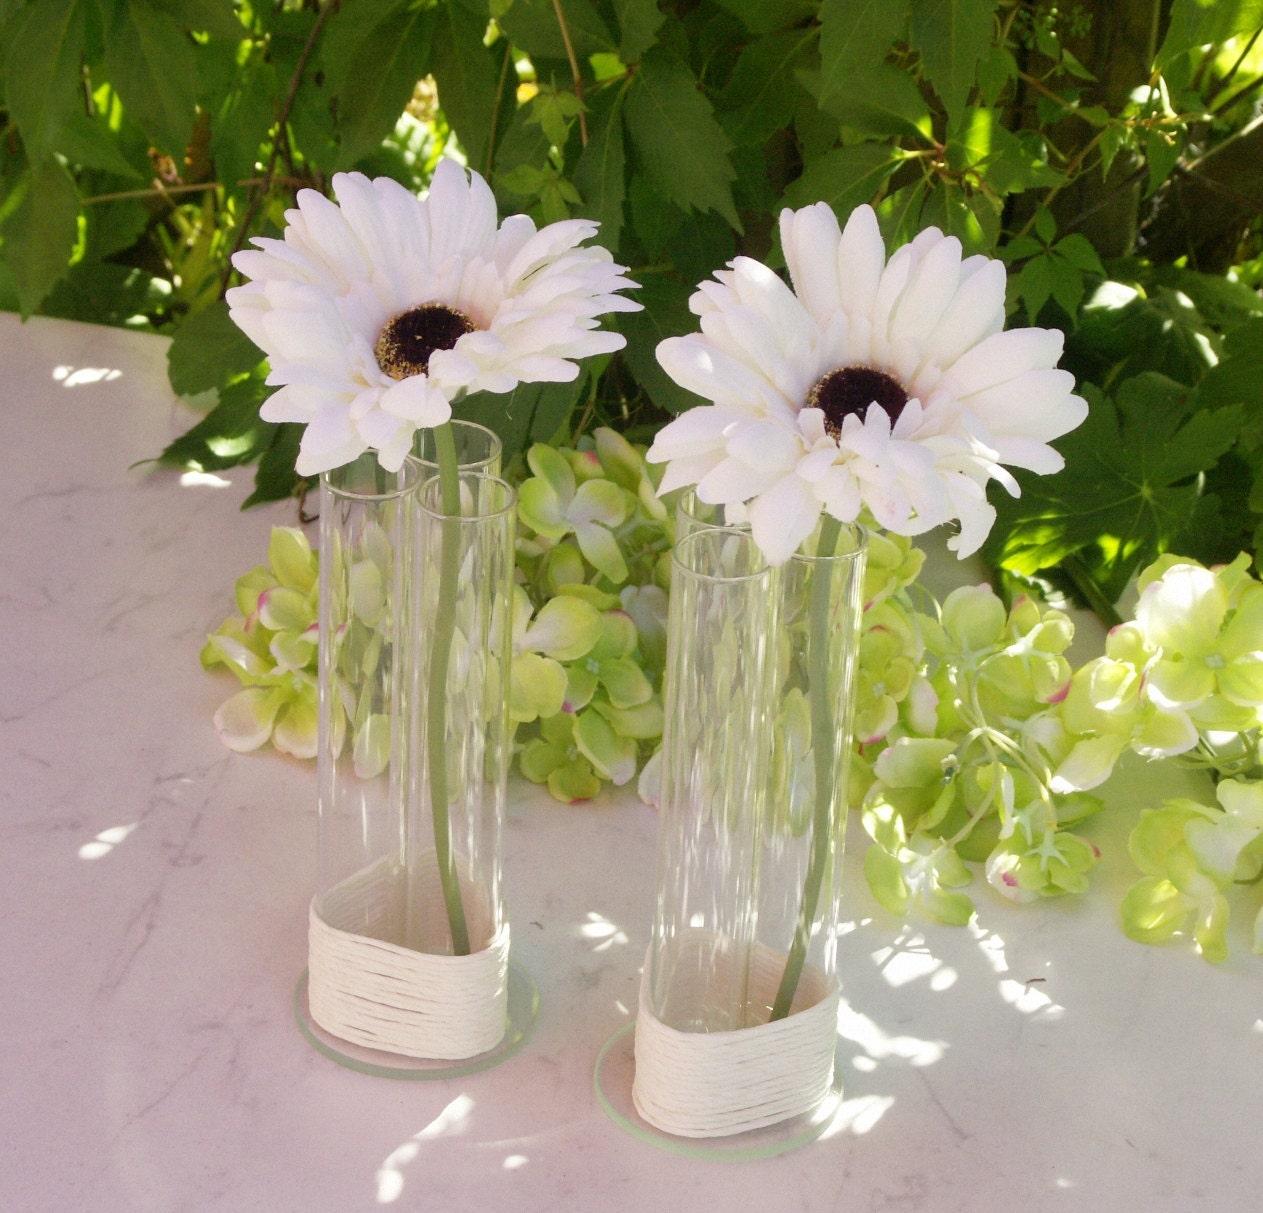 Decorative Test Tube Vase By Formomentsintime On Etsy